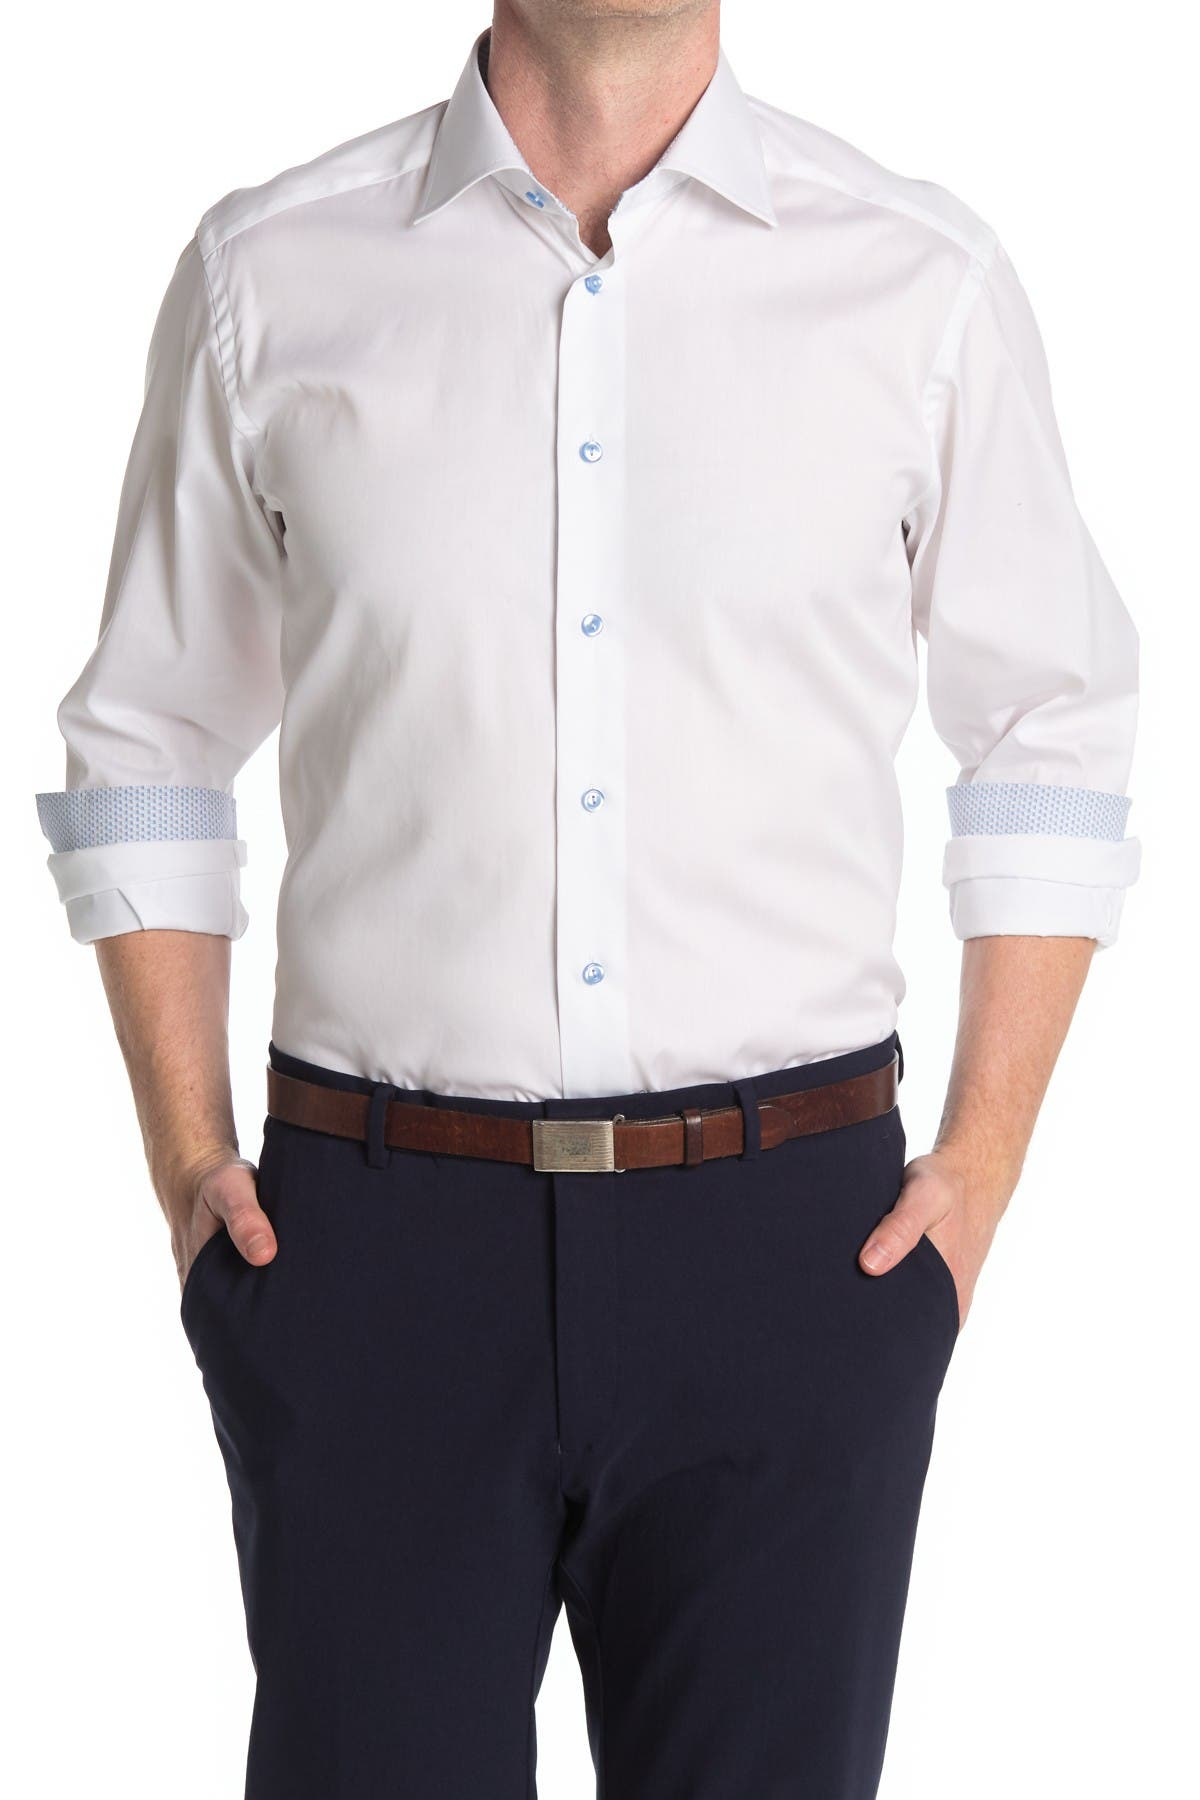 Details about  /NWT Eton men/'s size M long sleeve button down shirt chain link jacquard Slim Fi